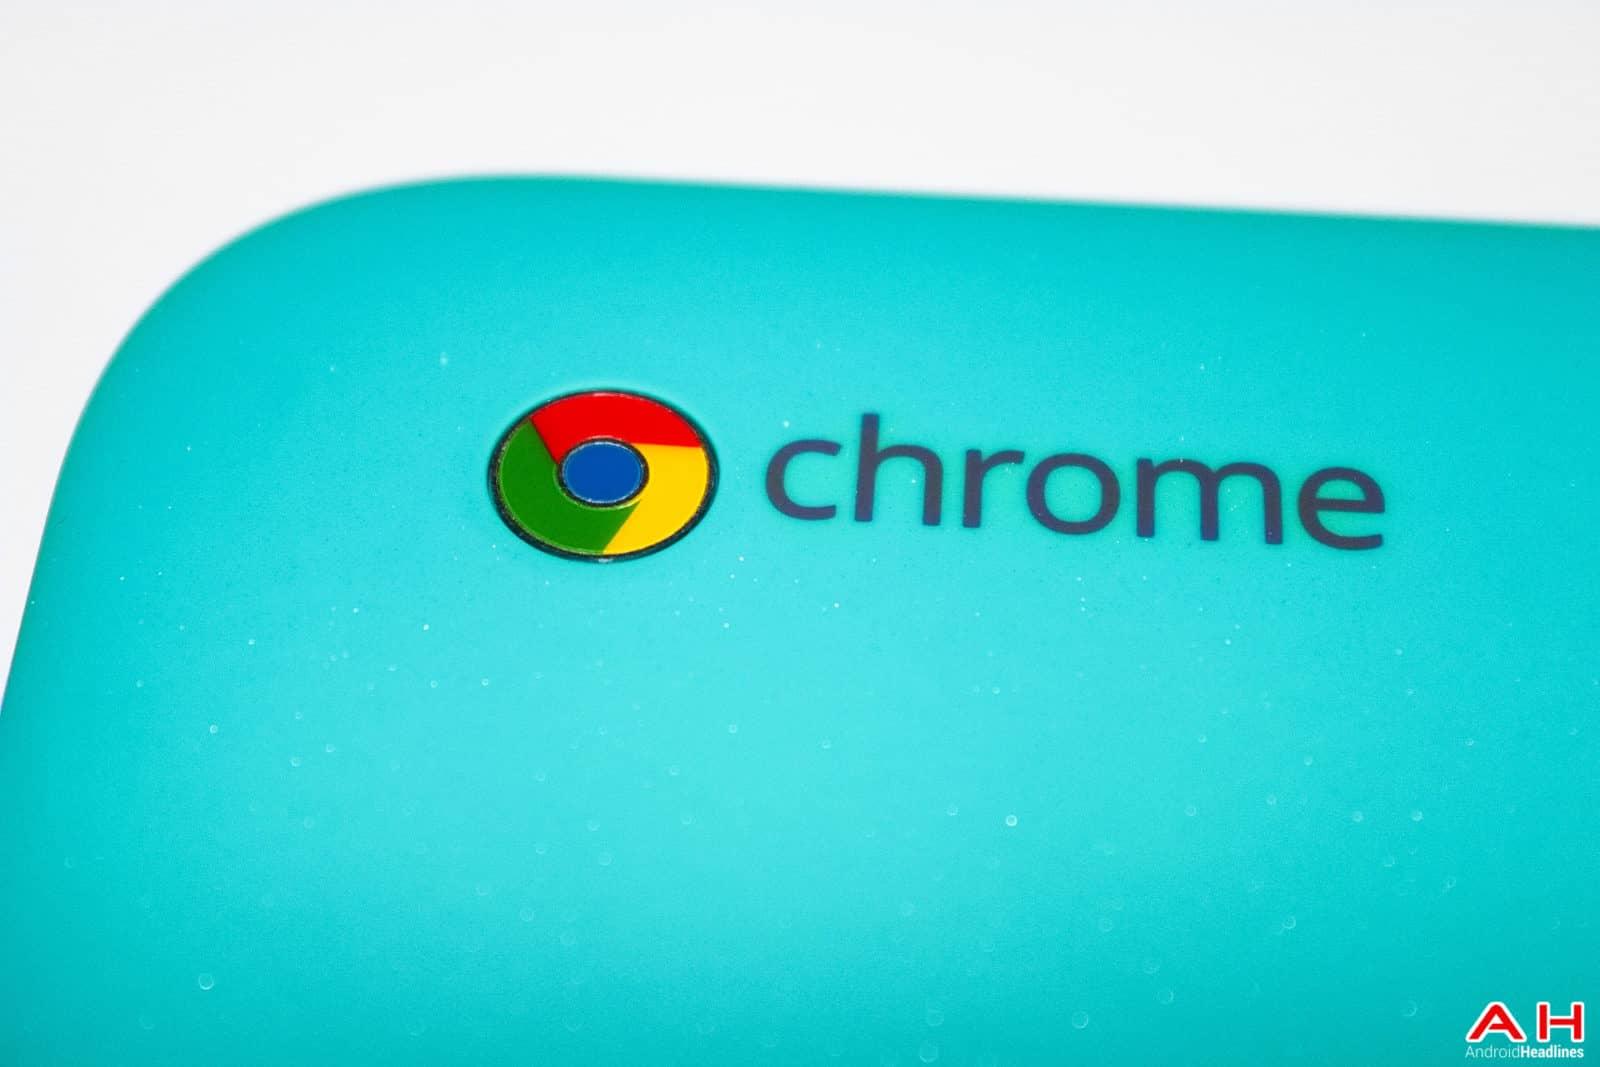 AH HP Chrome Chromebook 14-12